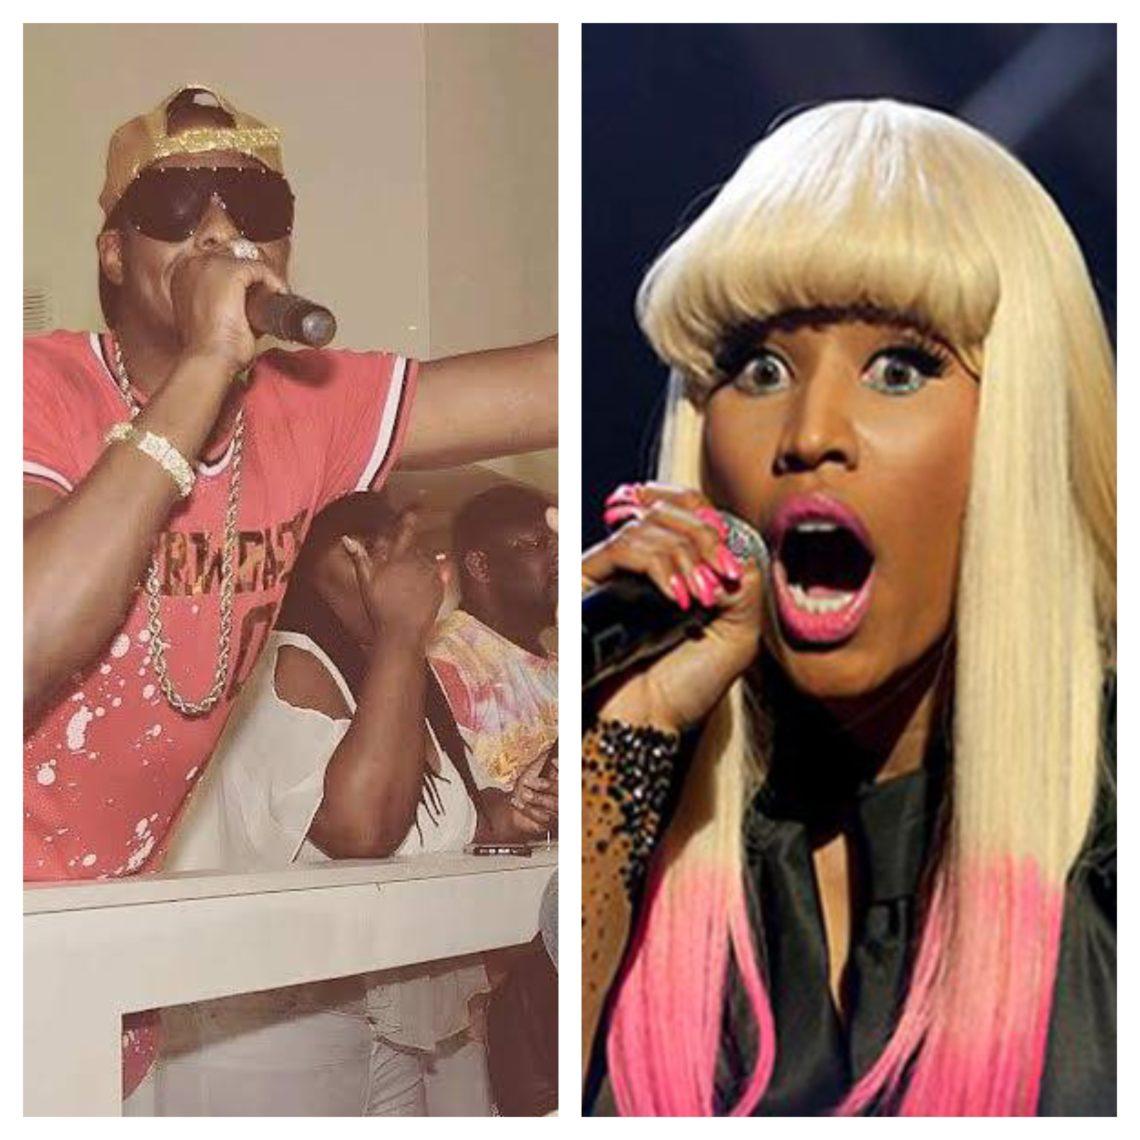 Artist P-kash and Artist nicki Minaj